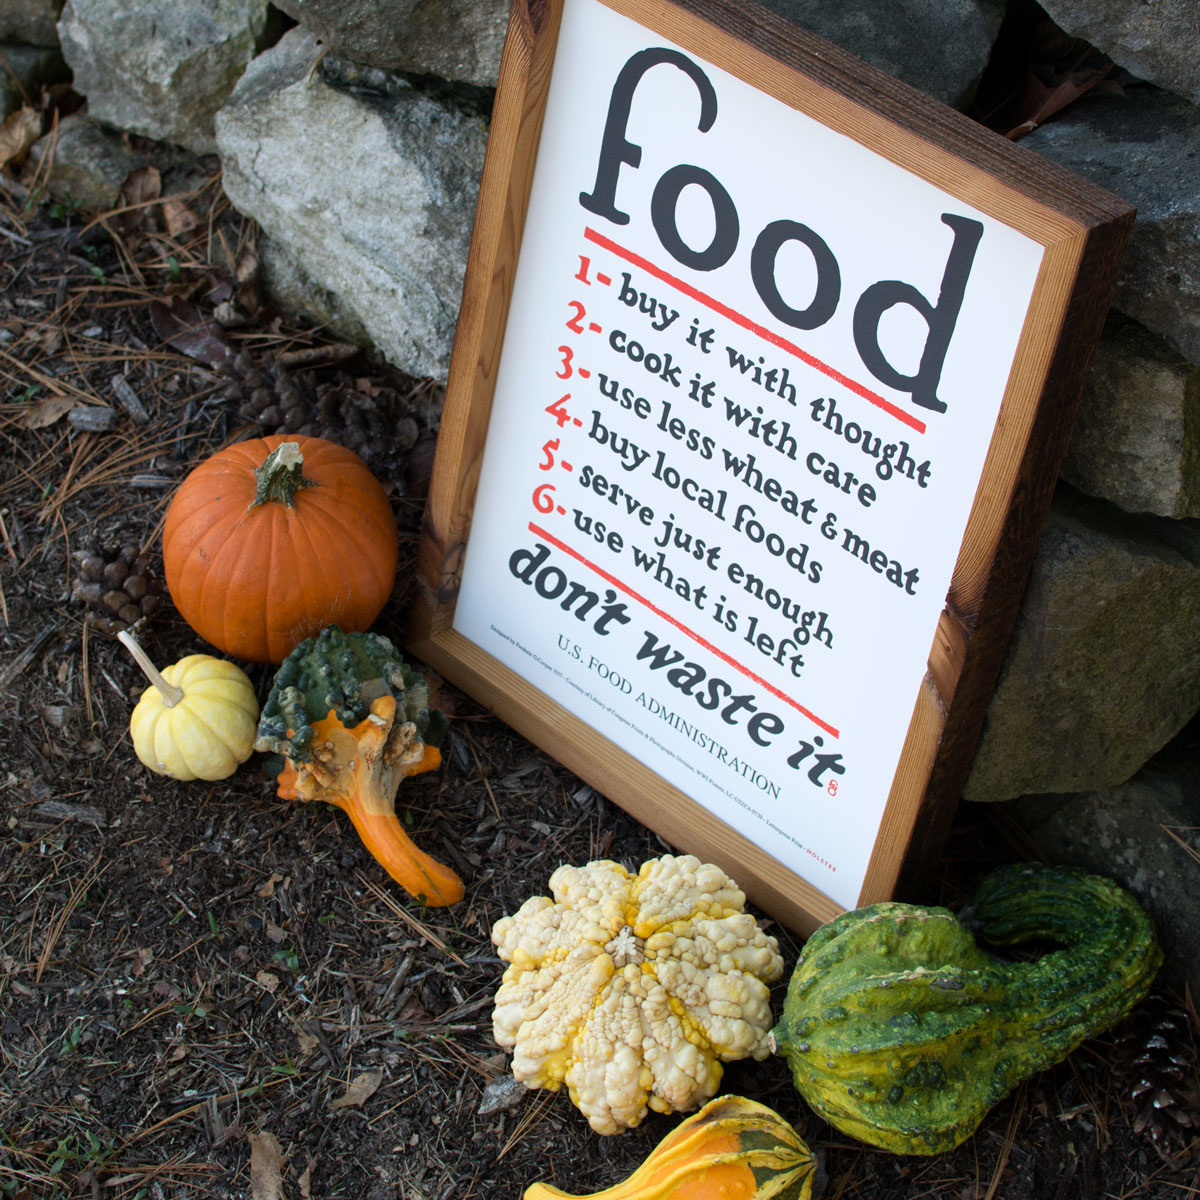 lg-food-rules-stone-wall-angle-1200px.jpg